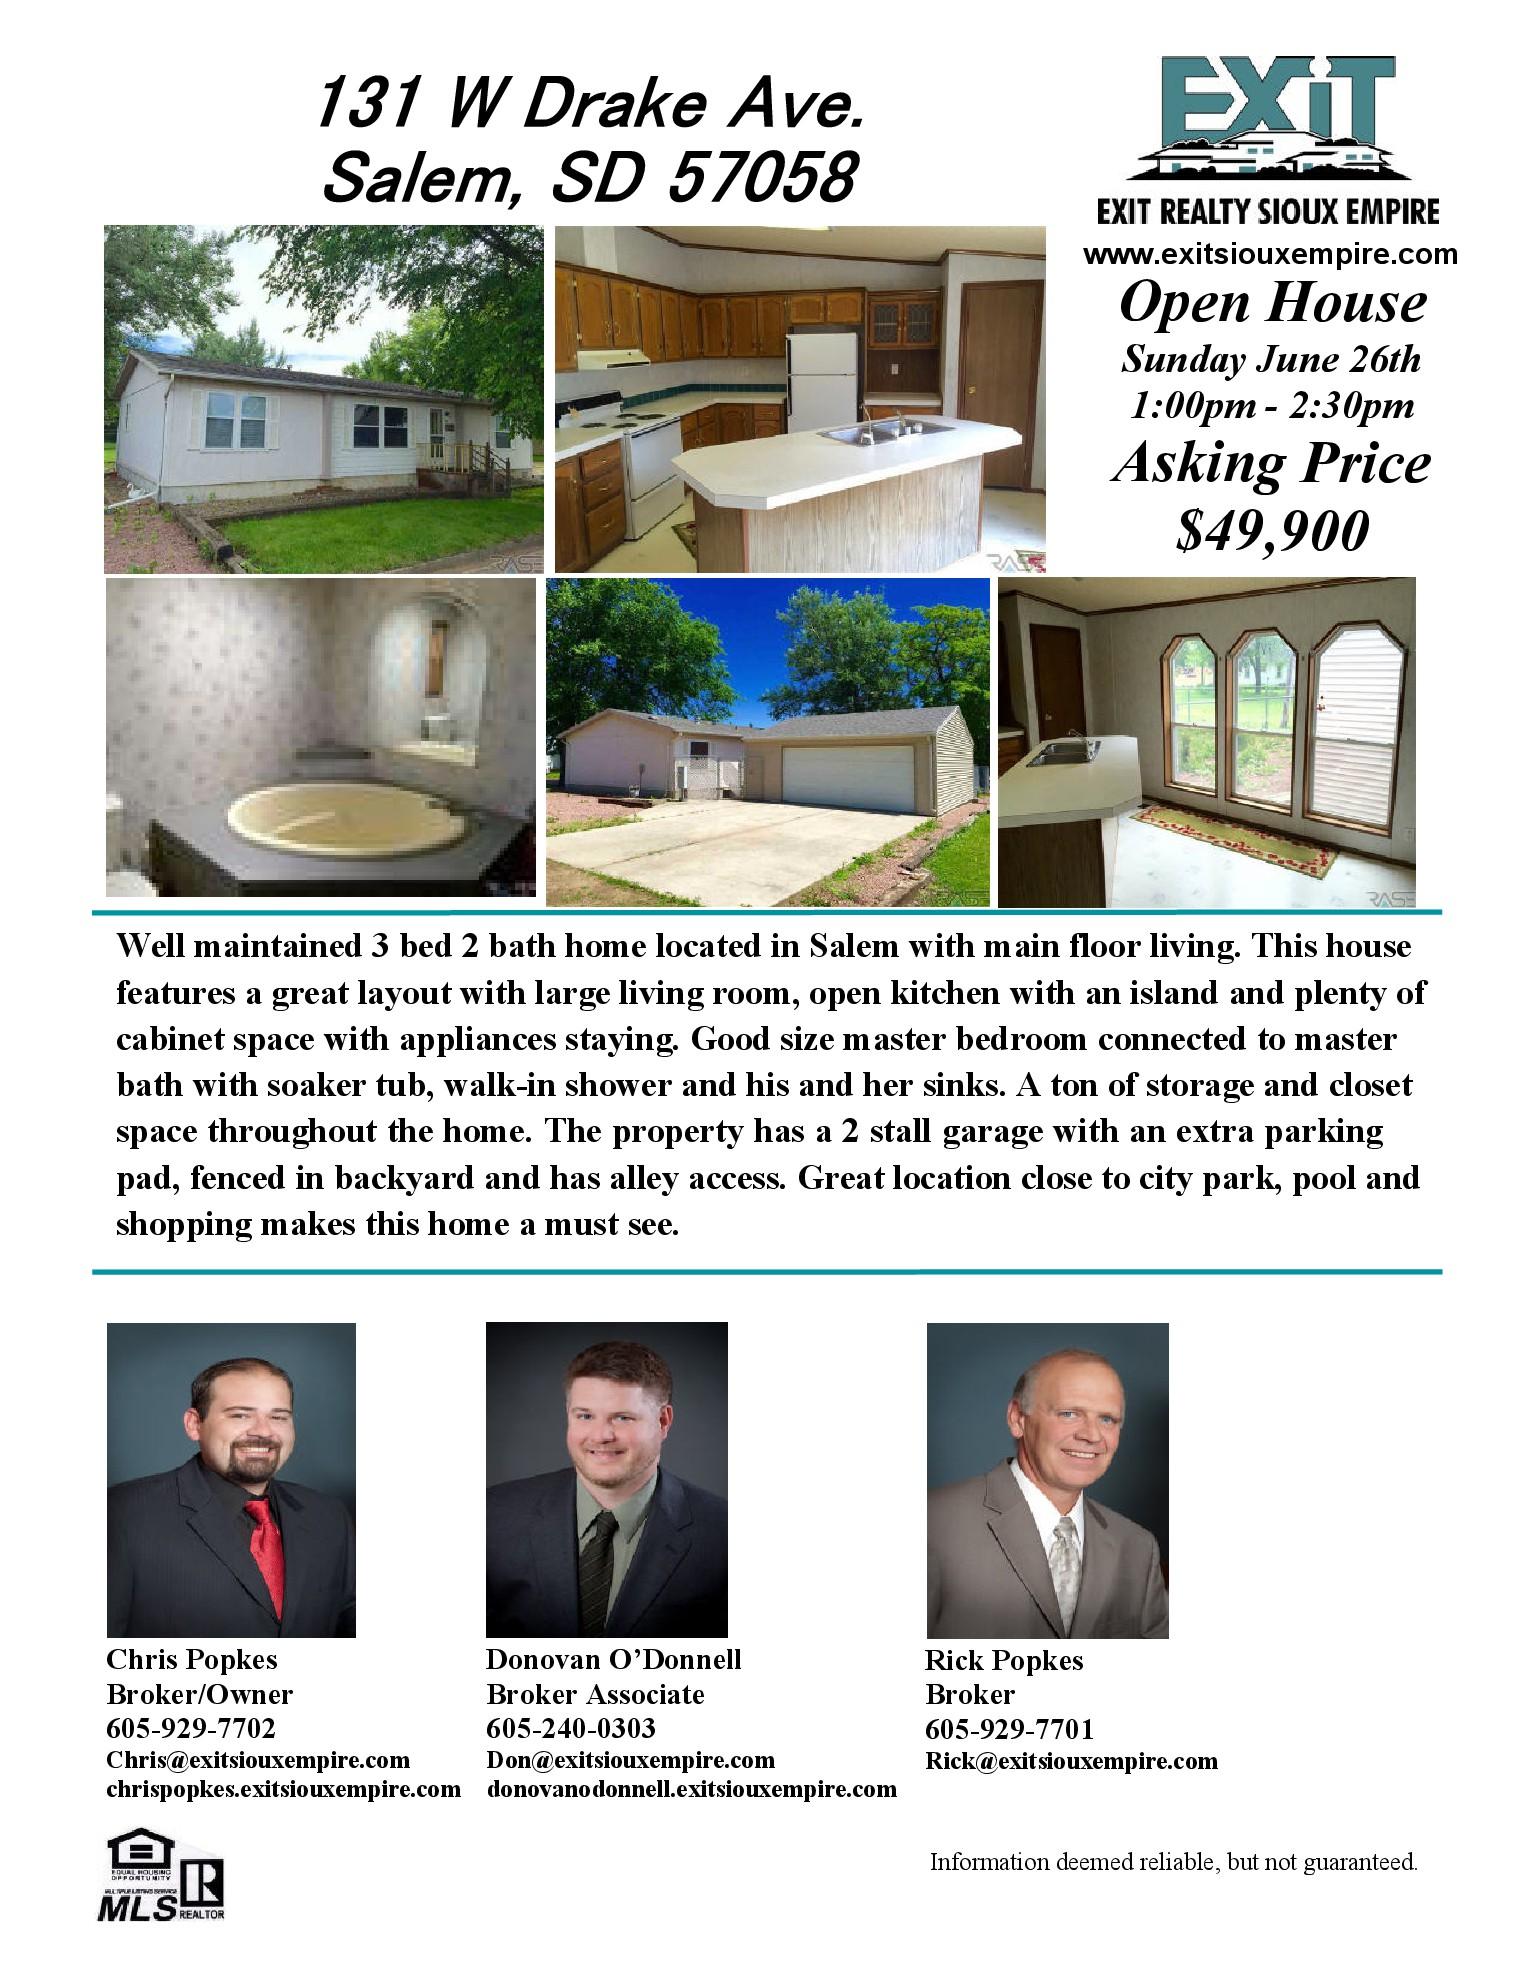 Open House Sunday June 26, 2016! 131 W Drake Ave. Salem, SD 57058